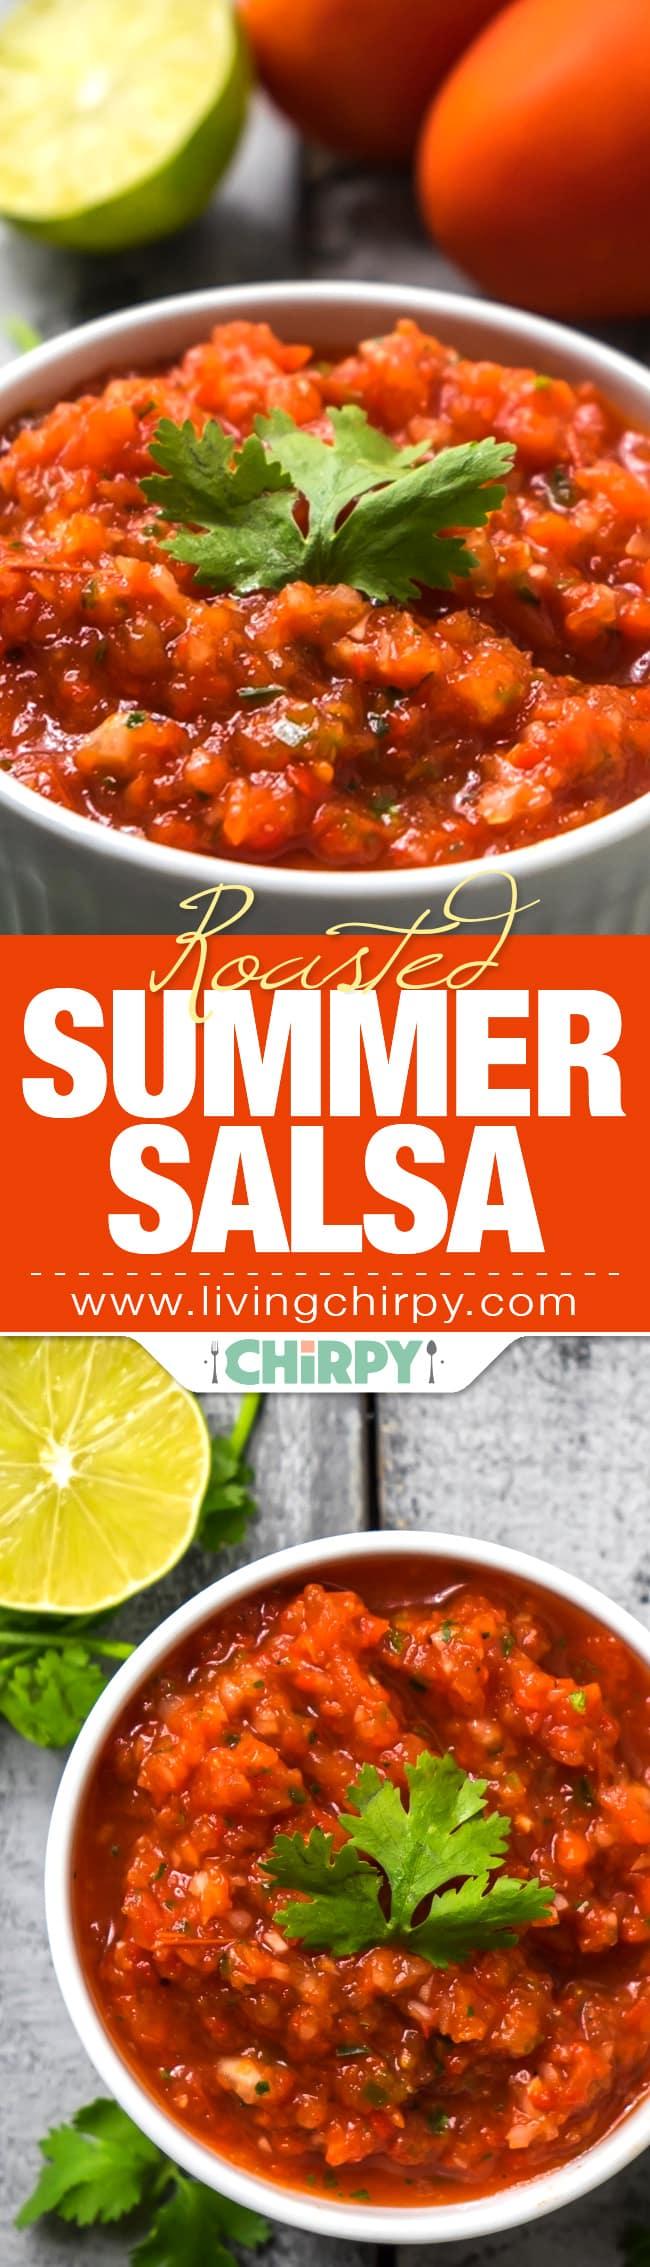 Roasted Summer Salsa Pin